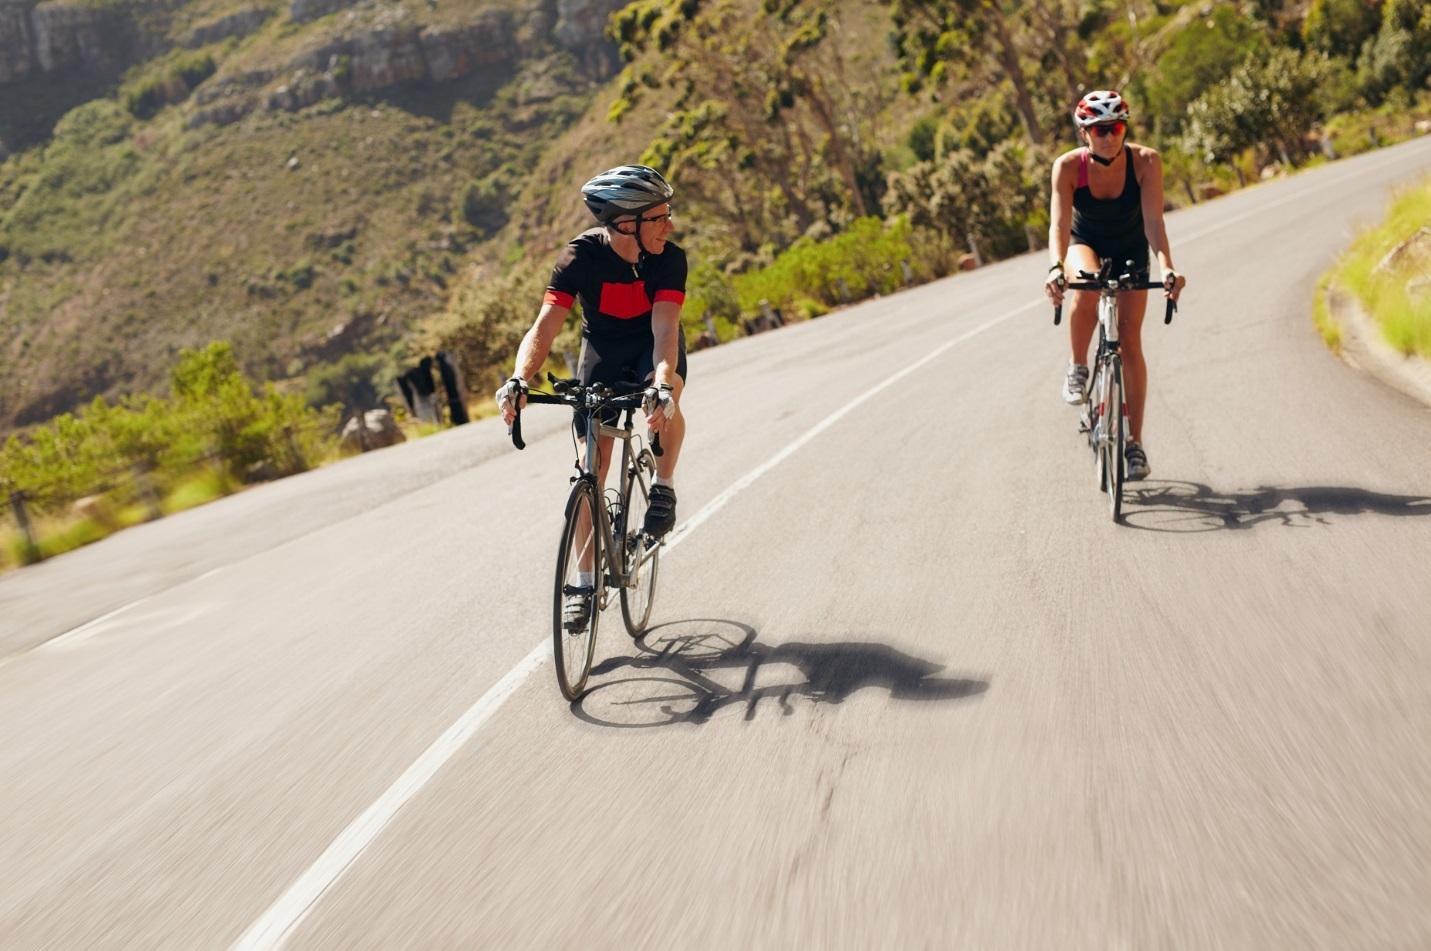 C:UsersivlevDownloadstwo-cyclist-practicing-for-triathlon-race-PQY9VFV.jpg